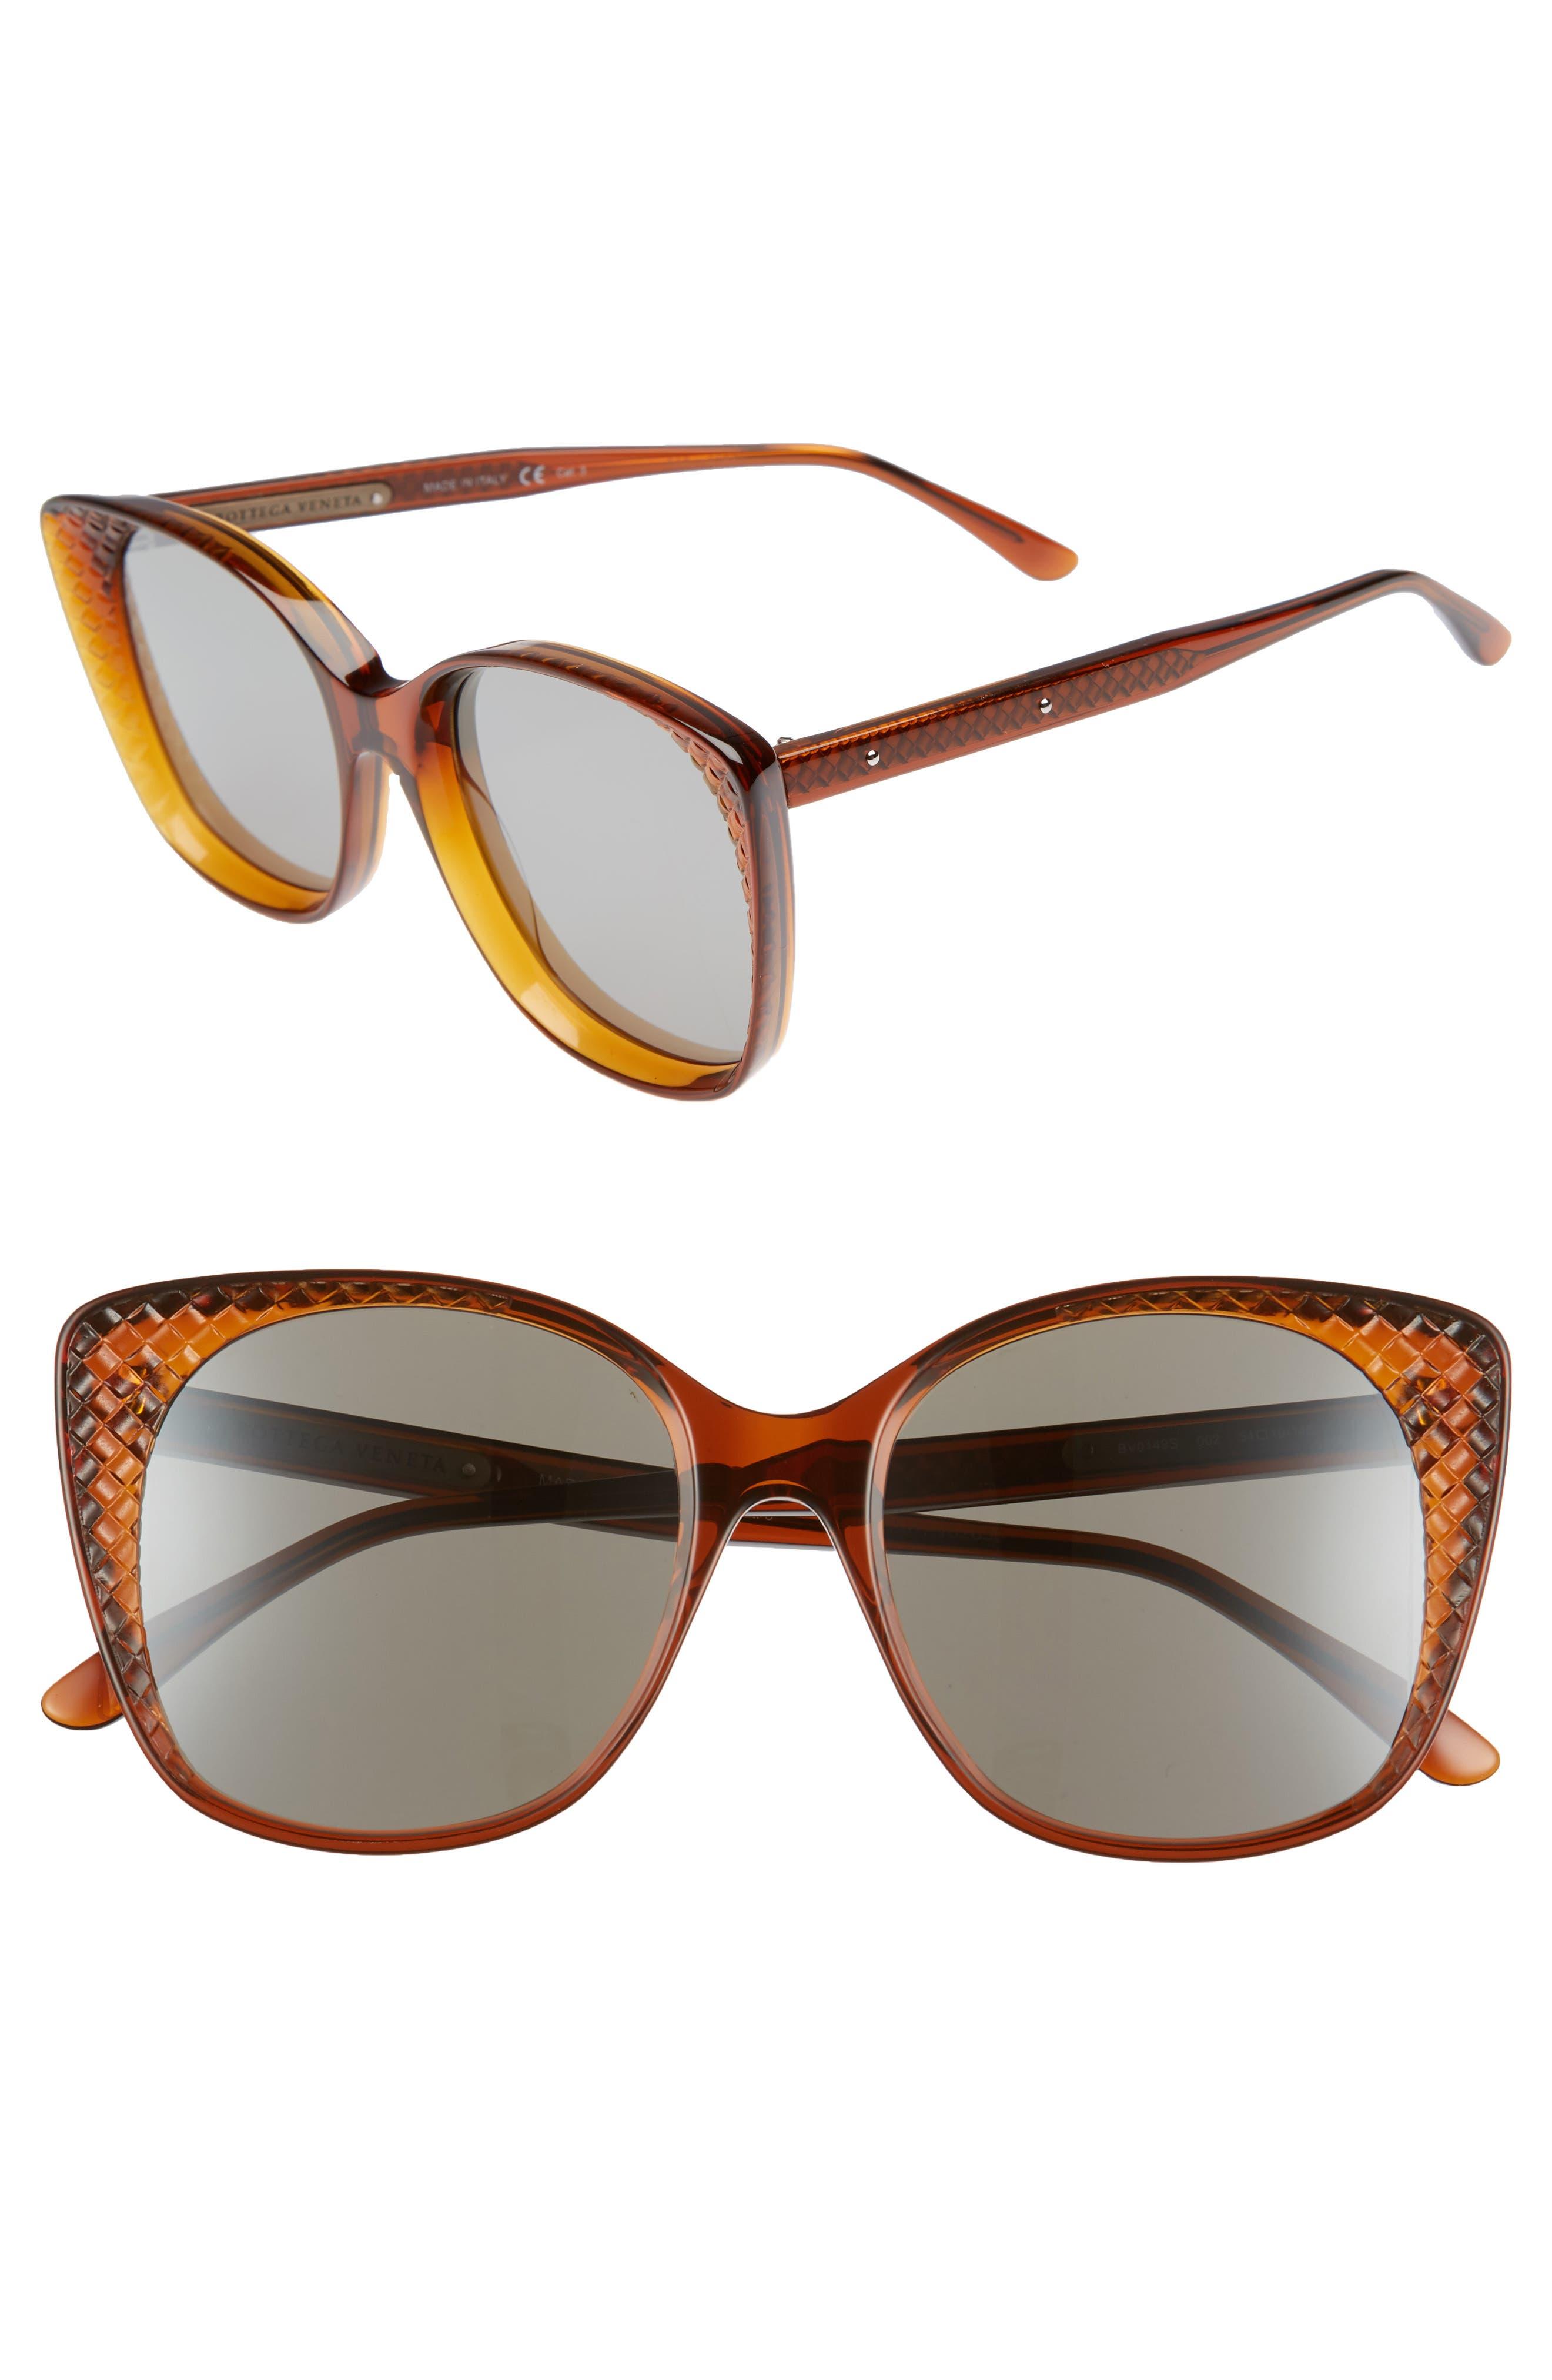 54mm Sunglasses,                             Main thumbnail 1, color,                             Chocolate Brown